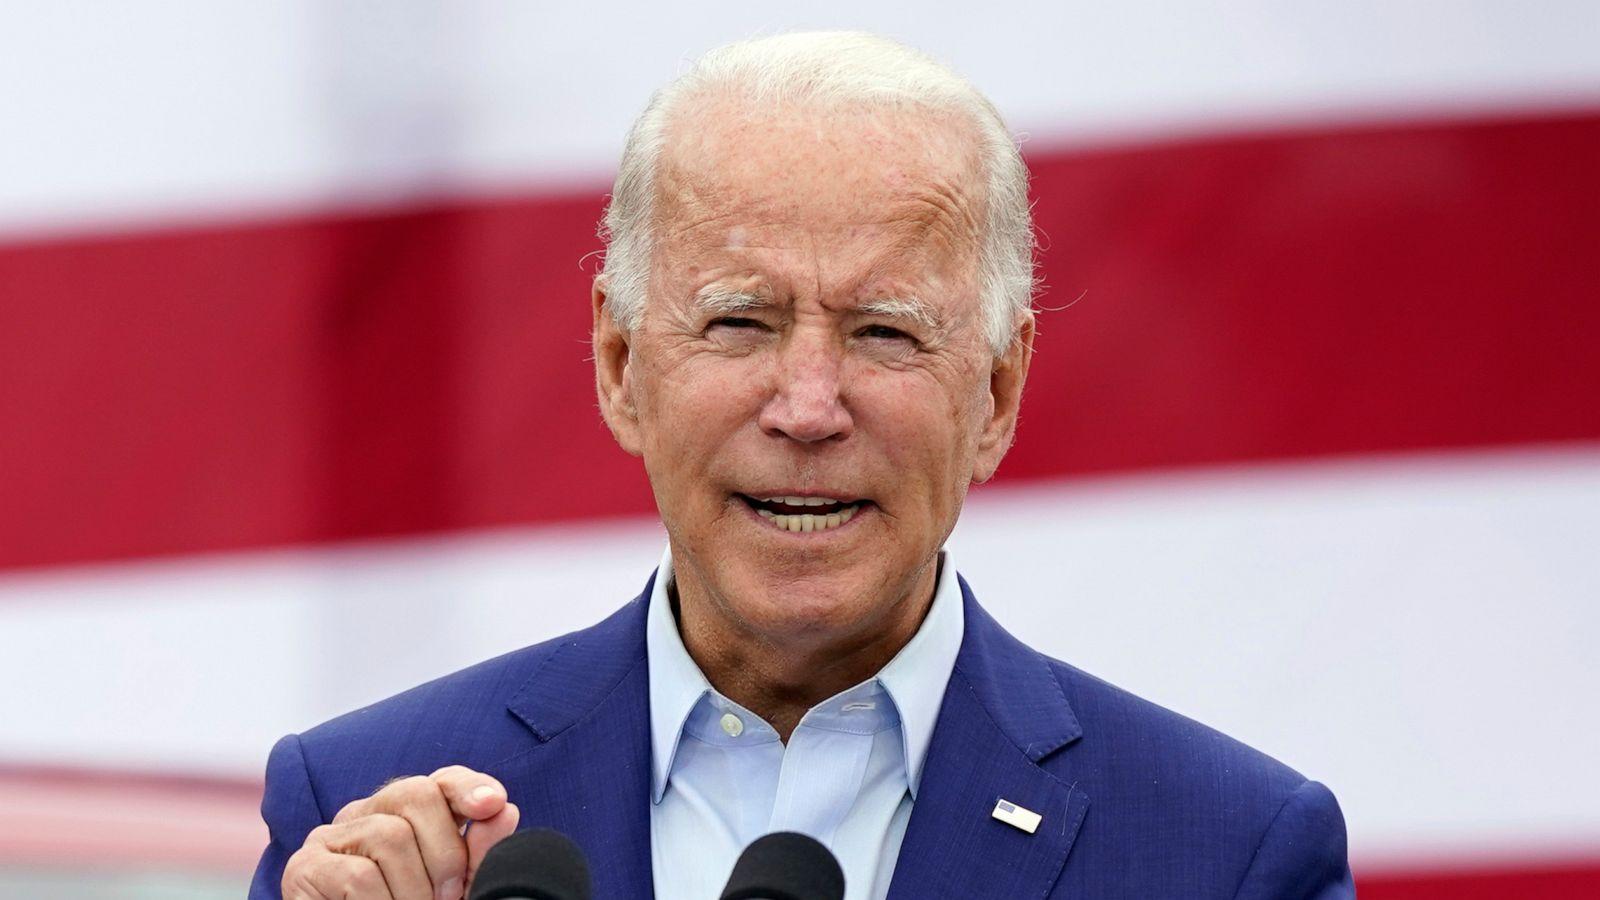 How to apply for Joe Biden's student loan relief 2021